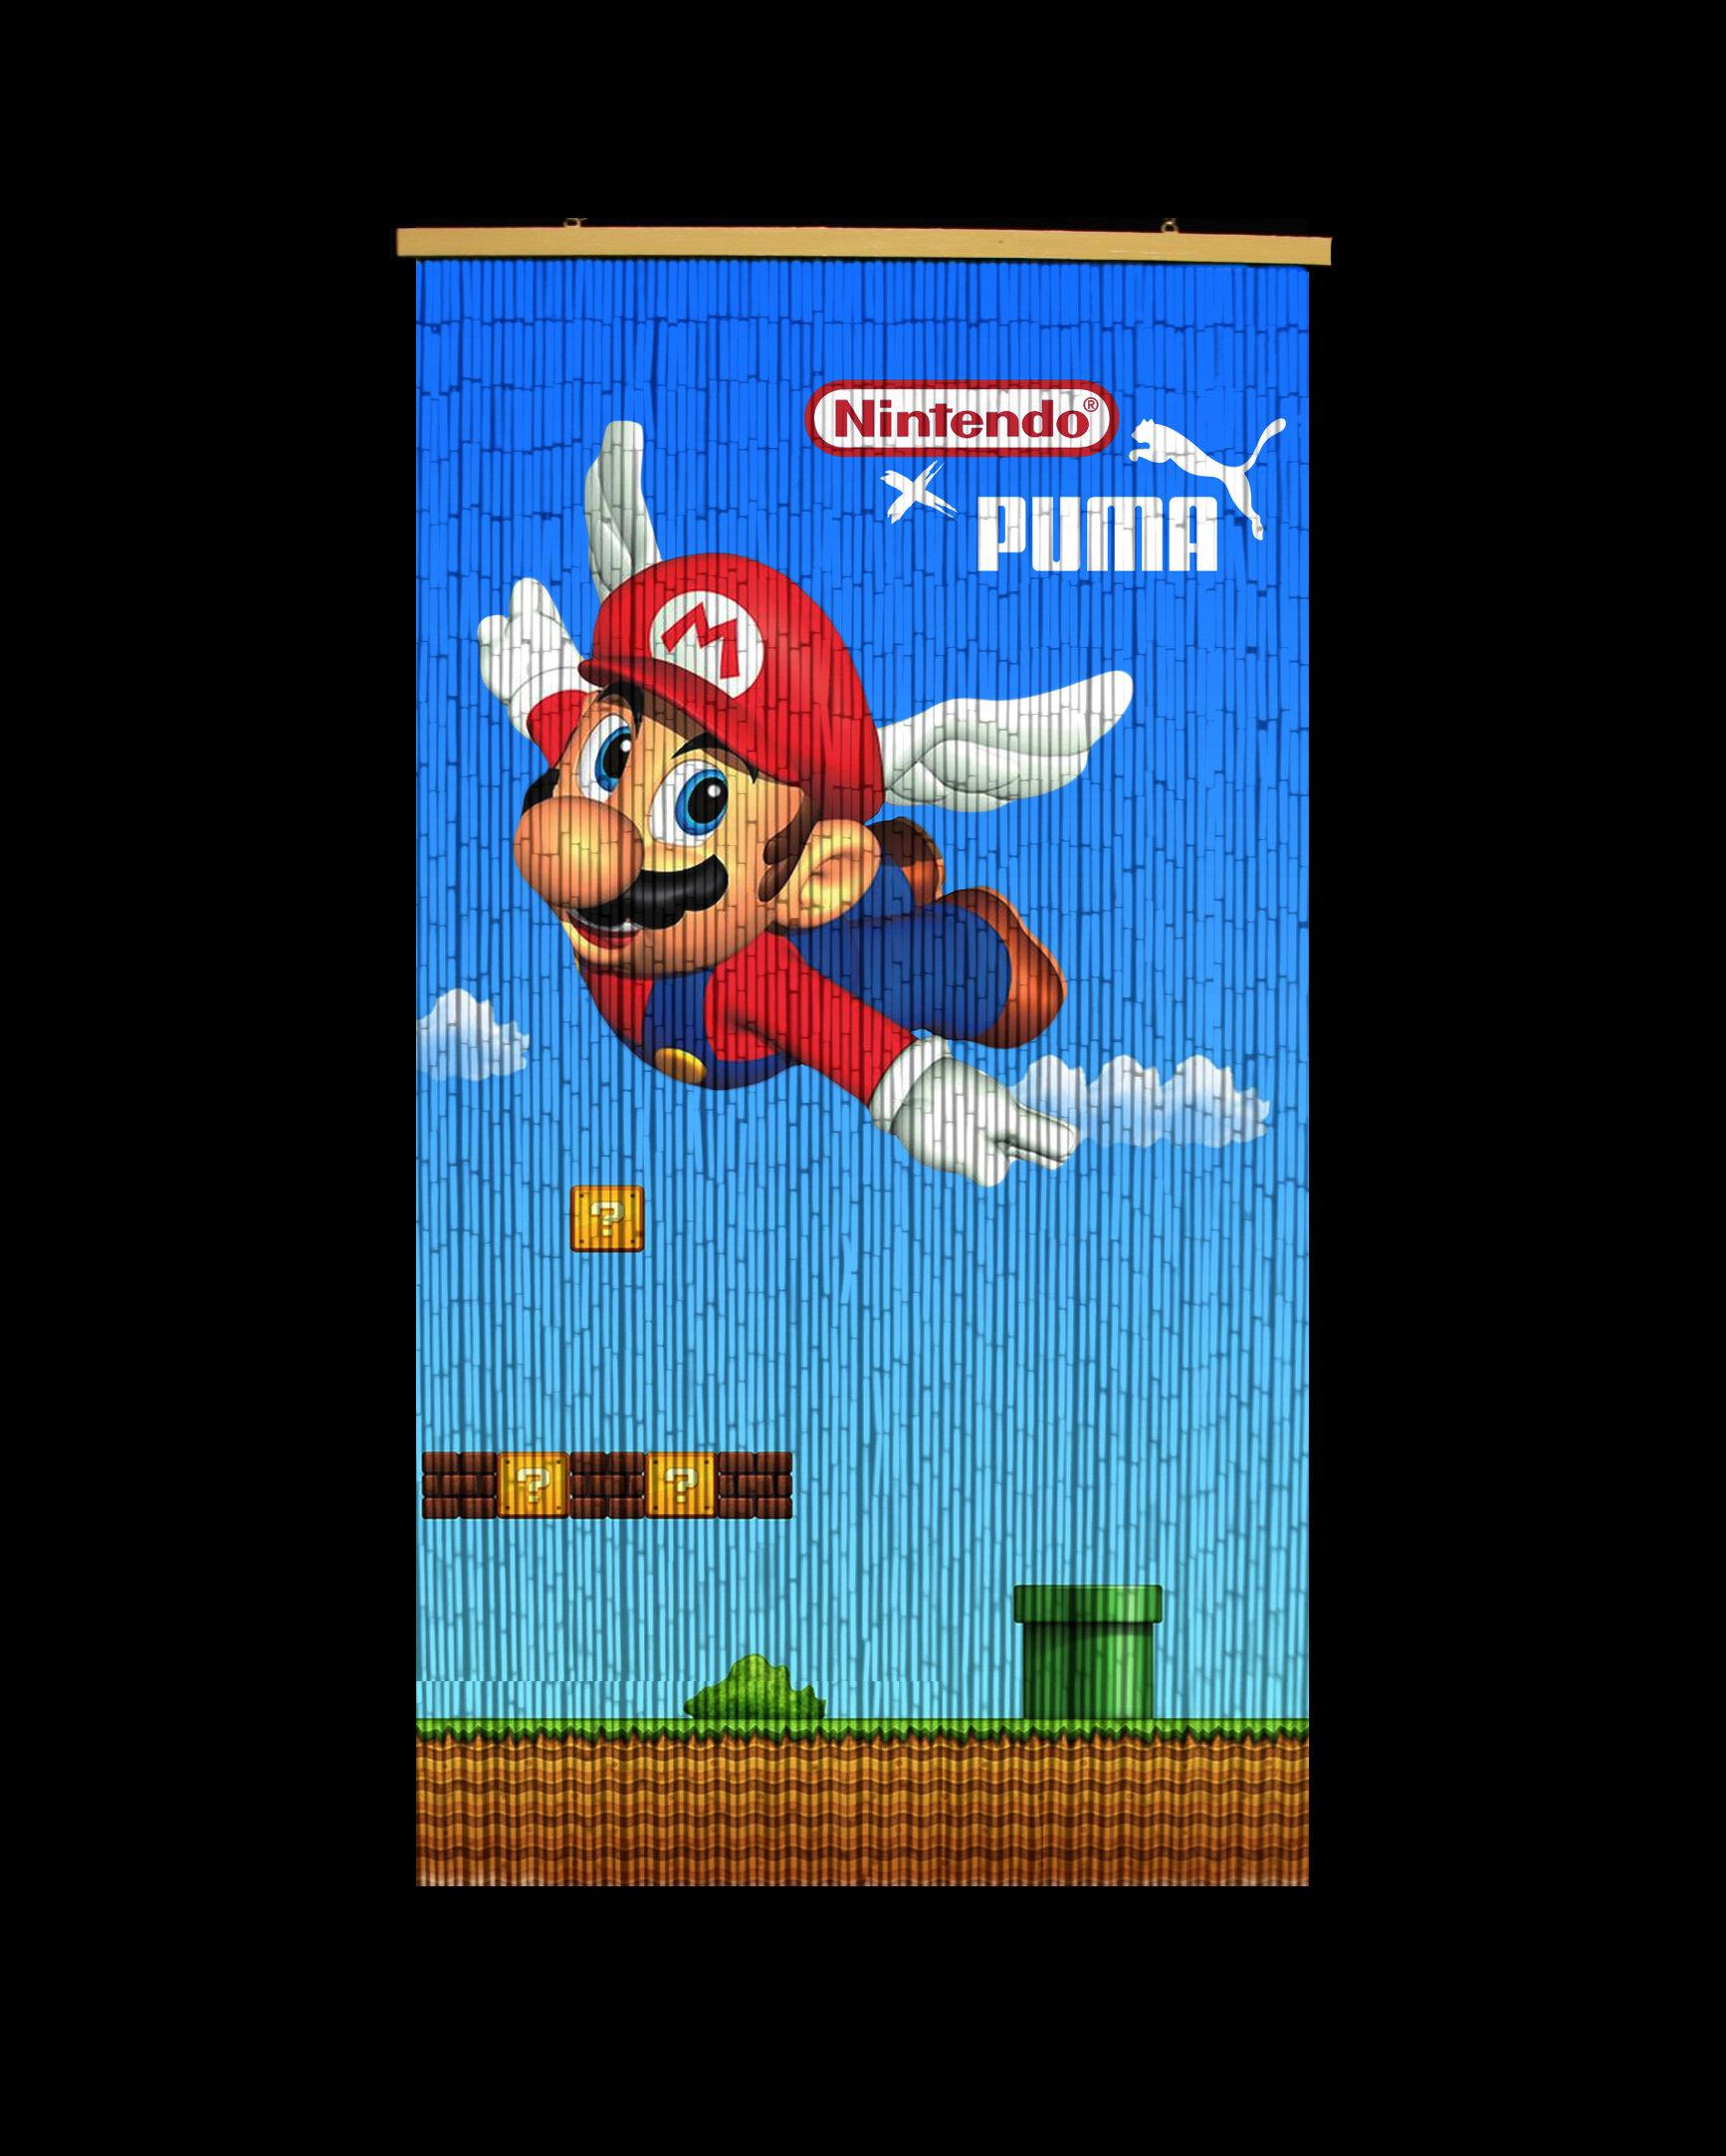 Bead Curtain Mario.jpg